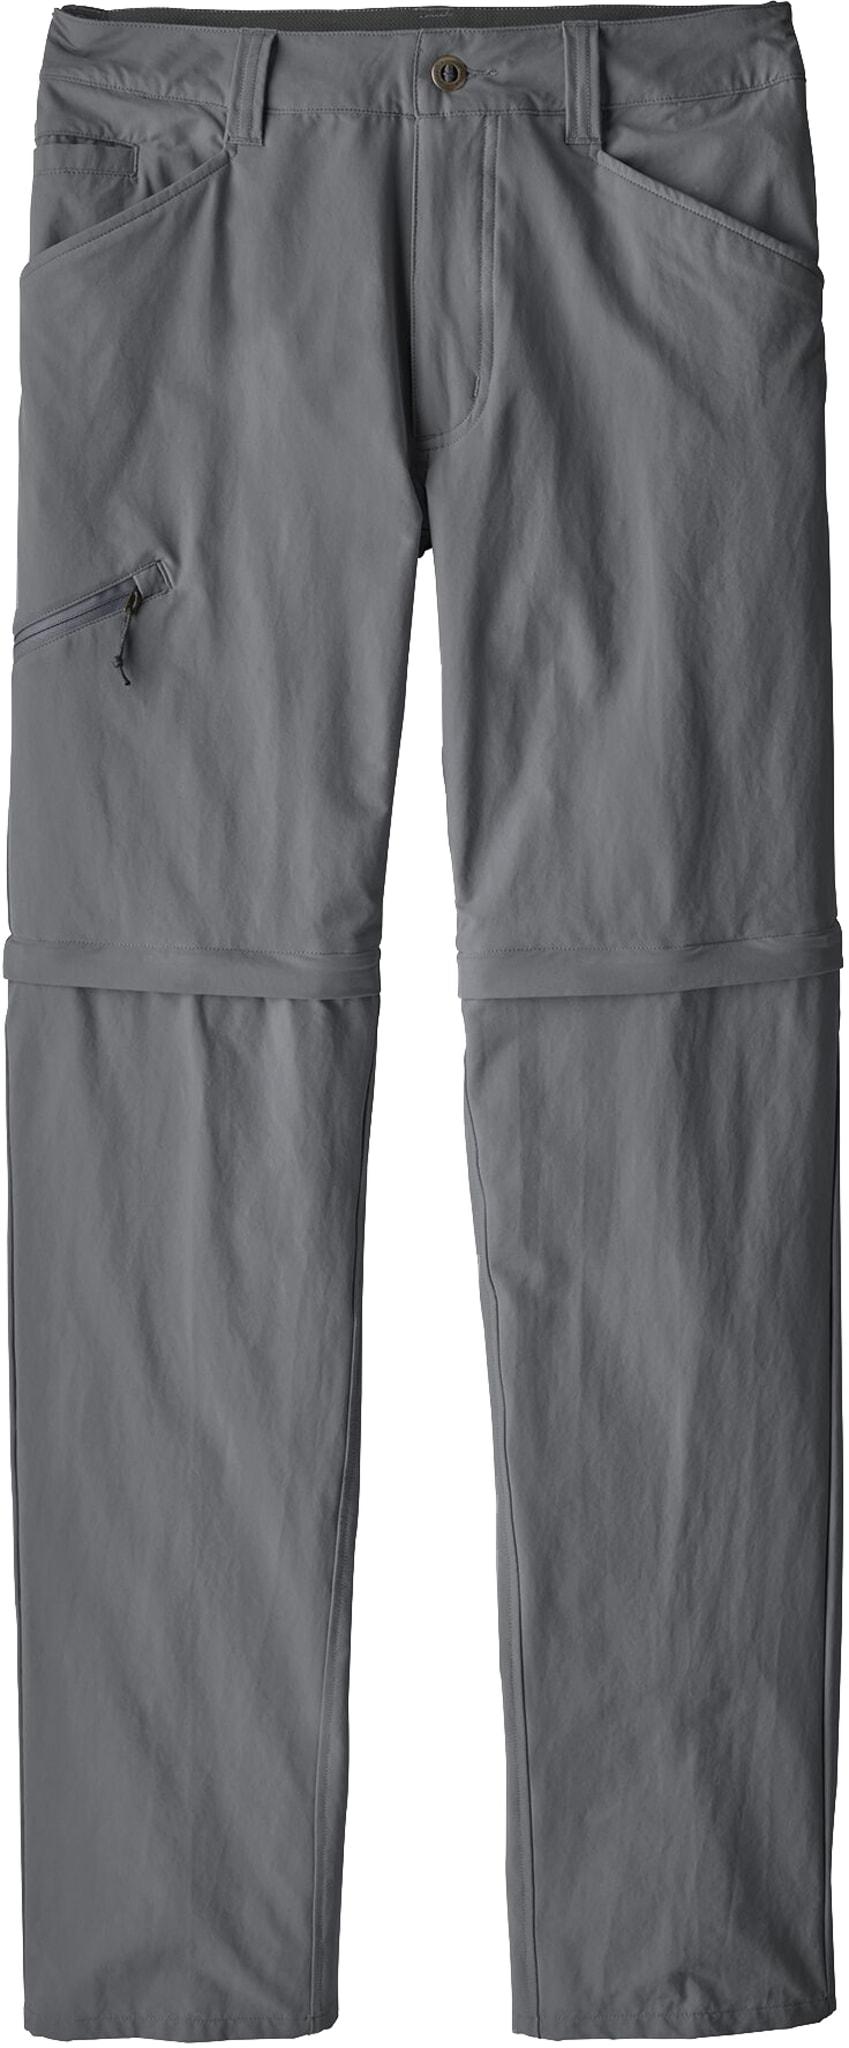 Quandary Convertible Pants M